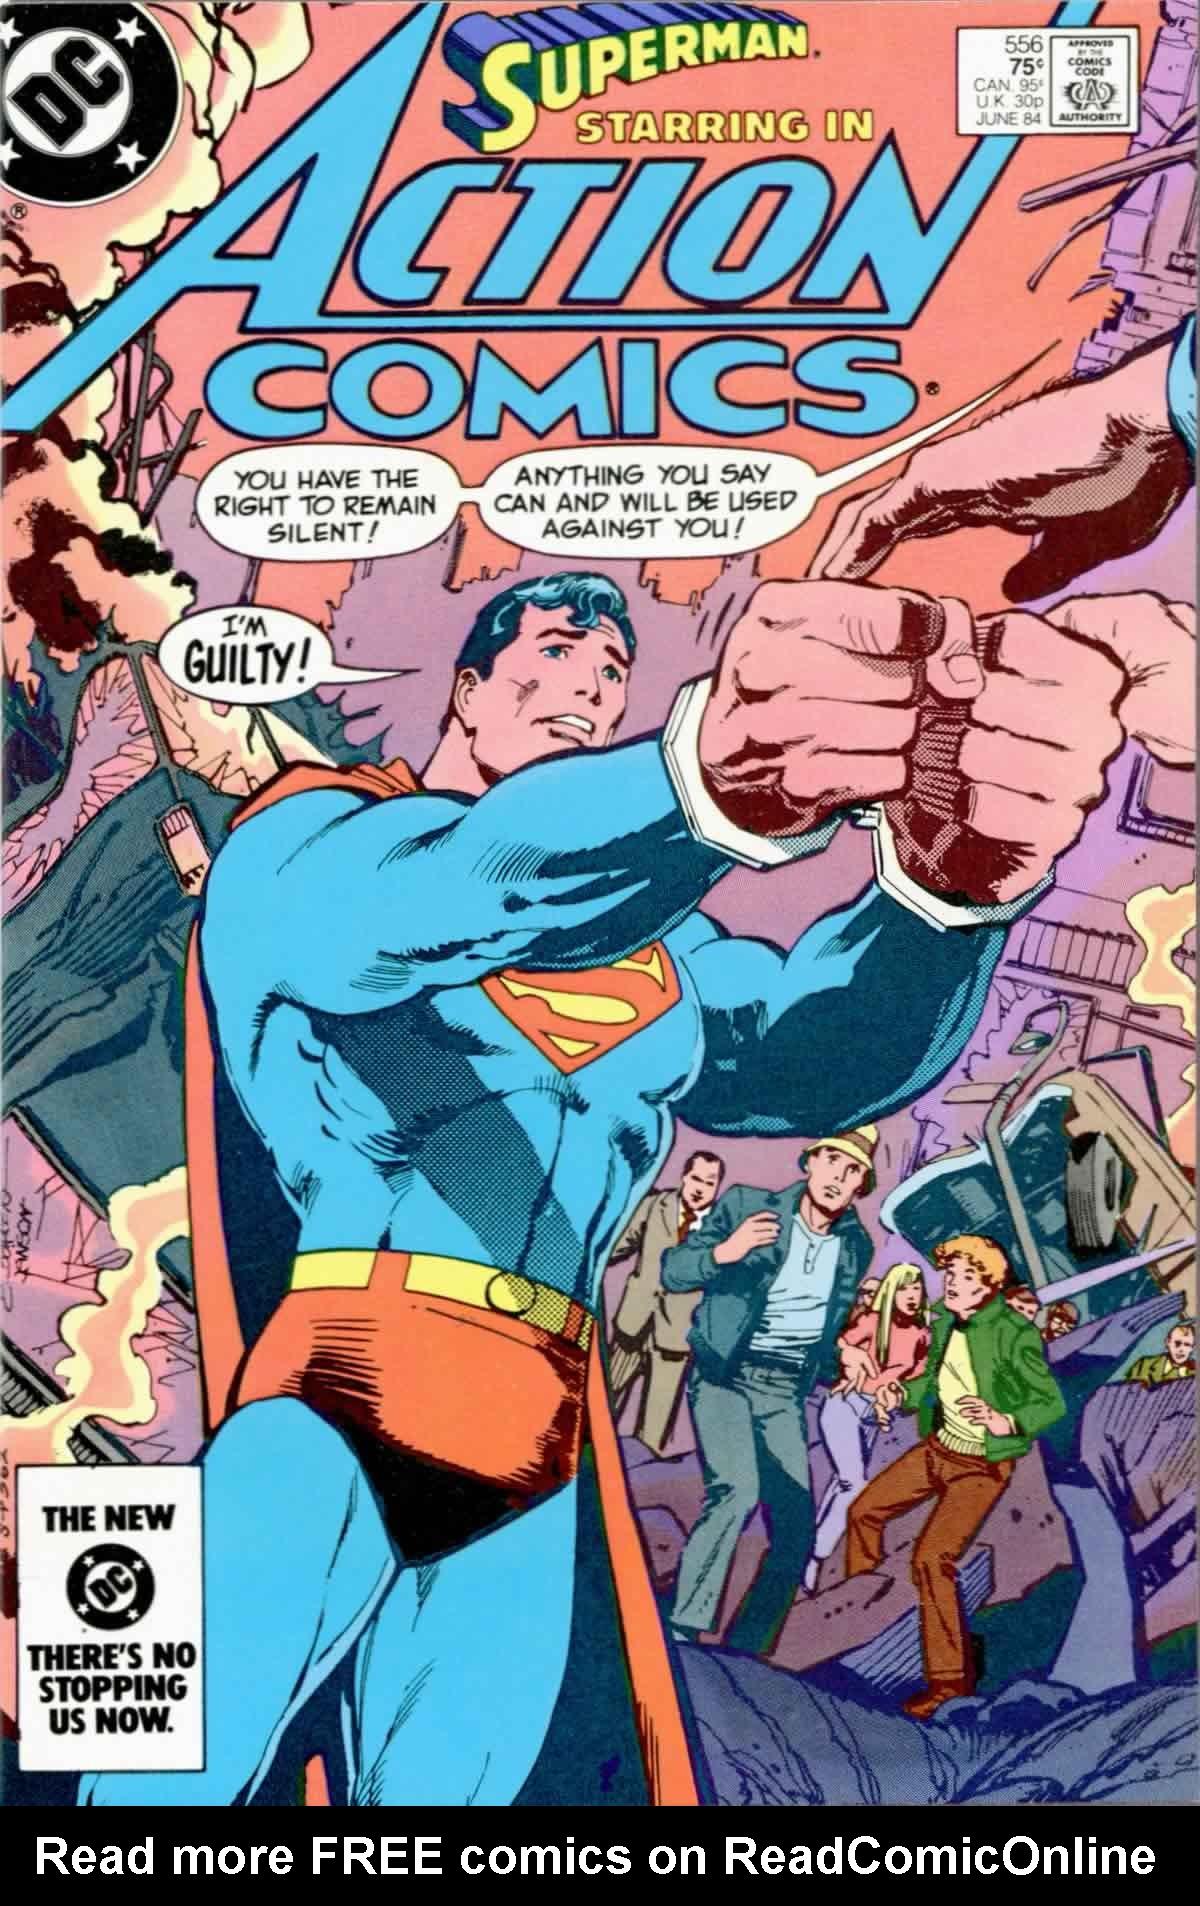 Action Comics (1938) 556 Page 1